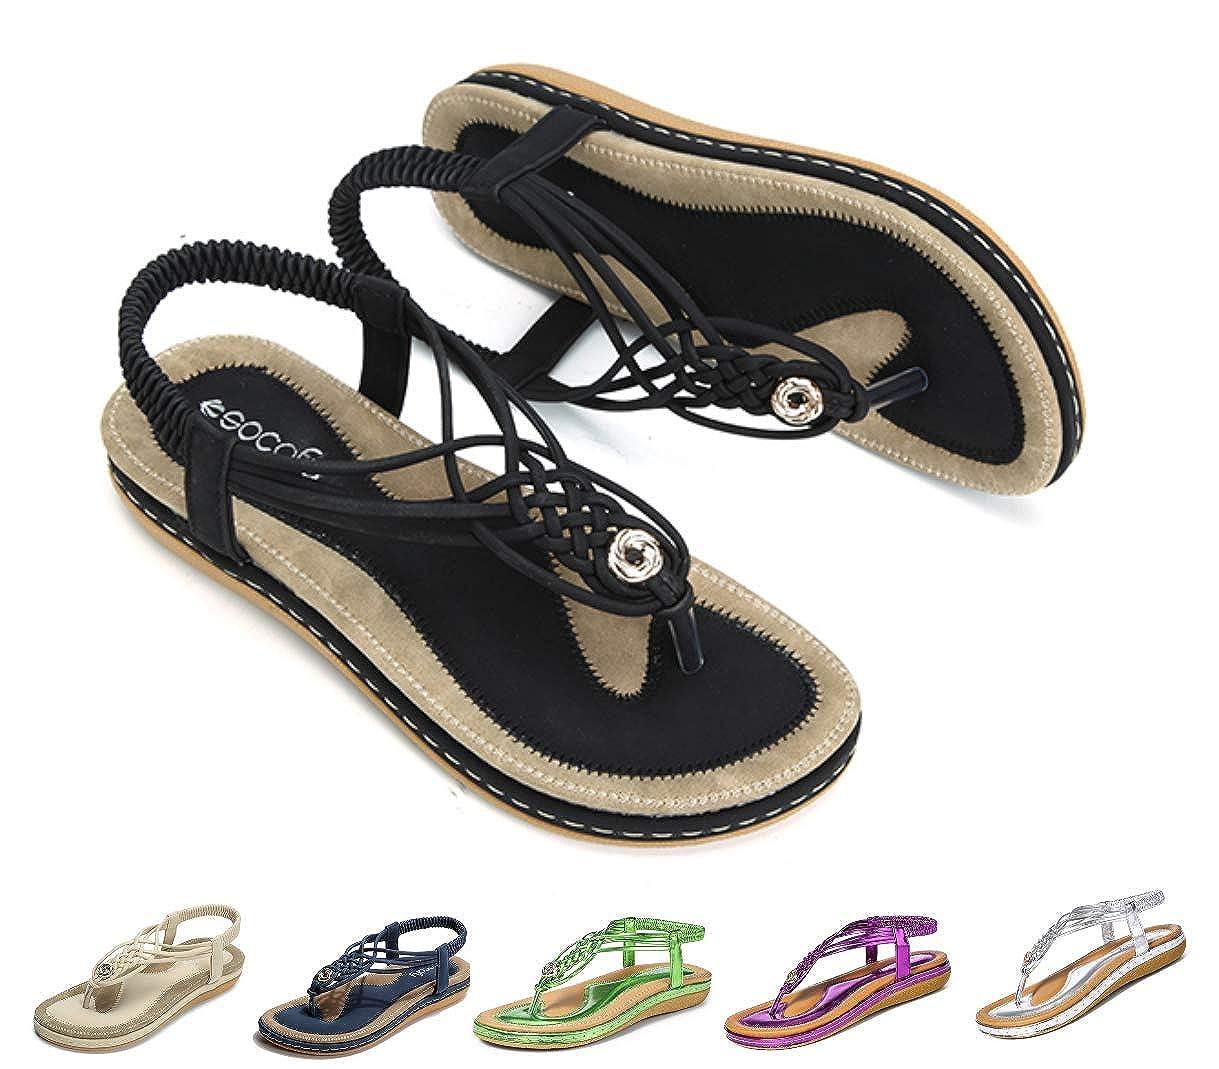 eaeb150185057 Socofy Women's Flat Sandals Summer Beach Walking Sandals Shoes Clip Toe  Flip Flops Thongs Bohemian Wedge Shoes Ladies Slip On Open Toe T-Strap  Braided ...